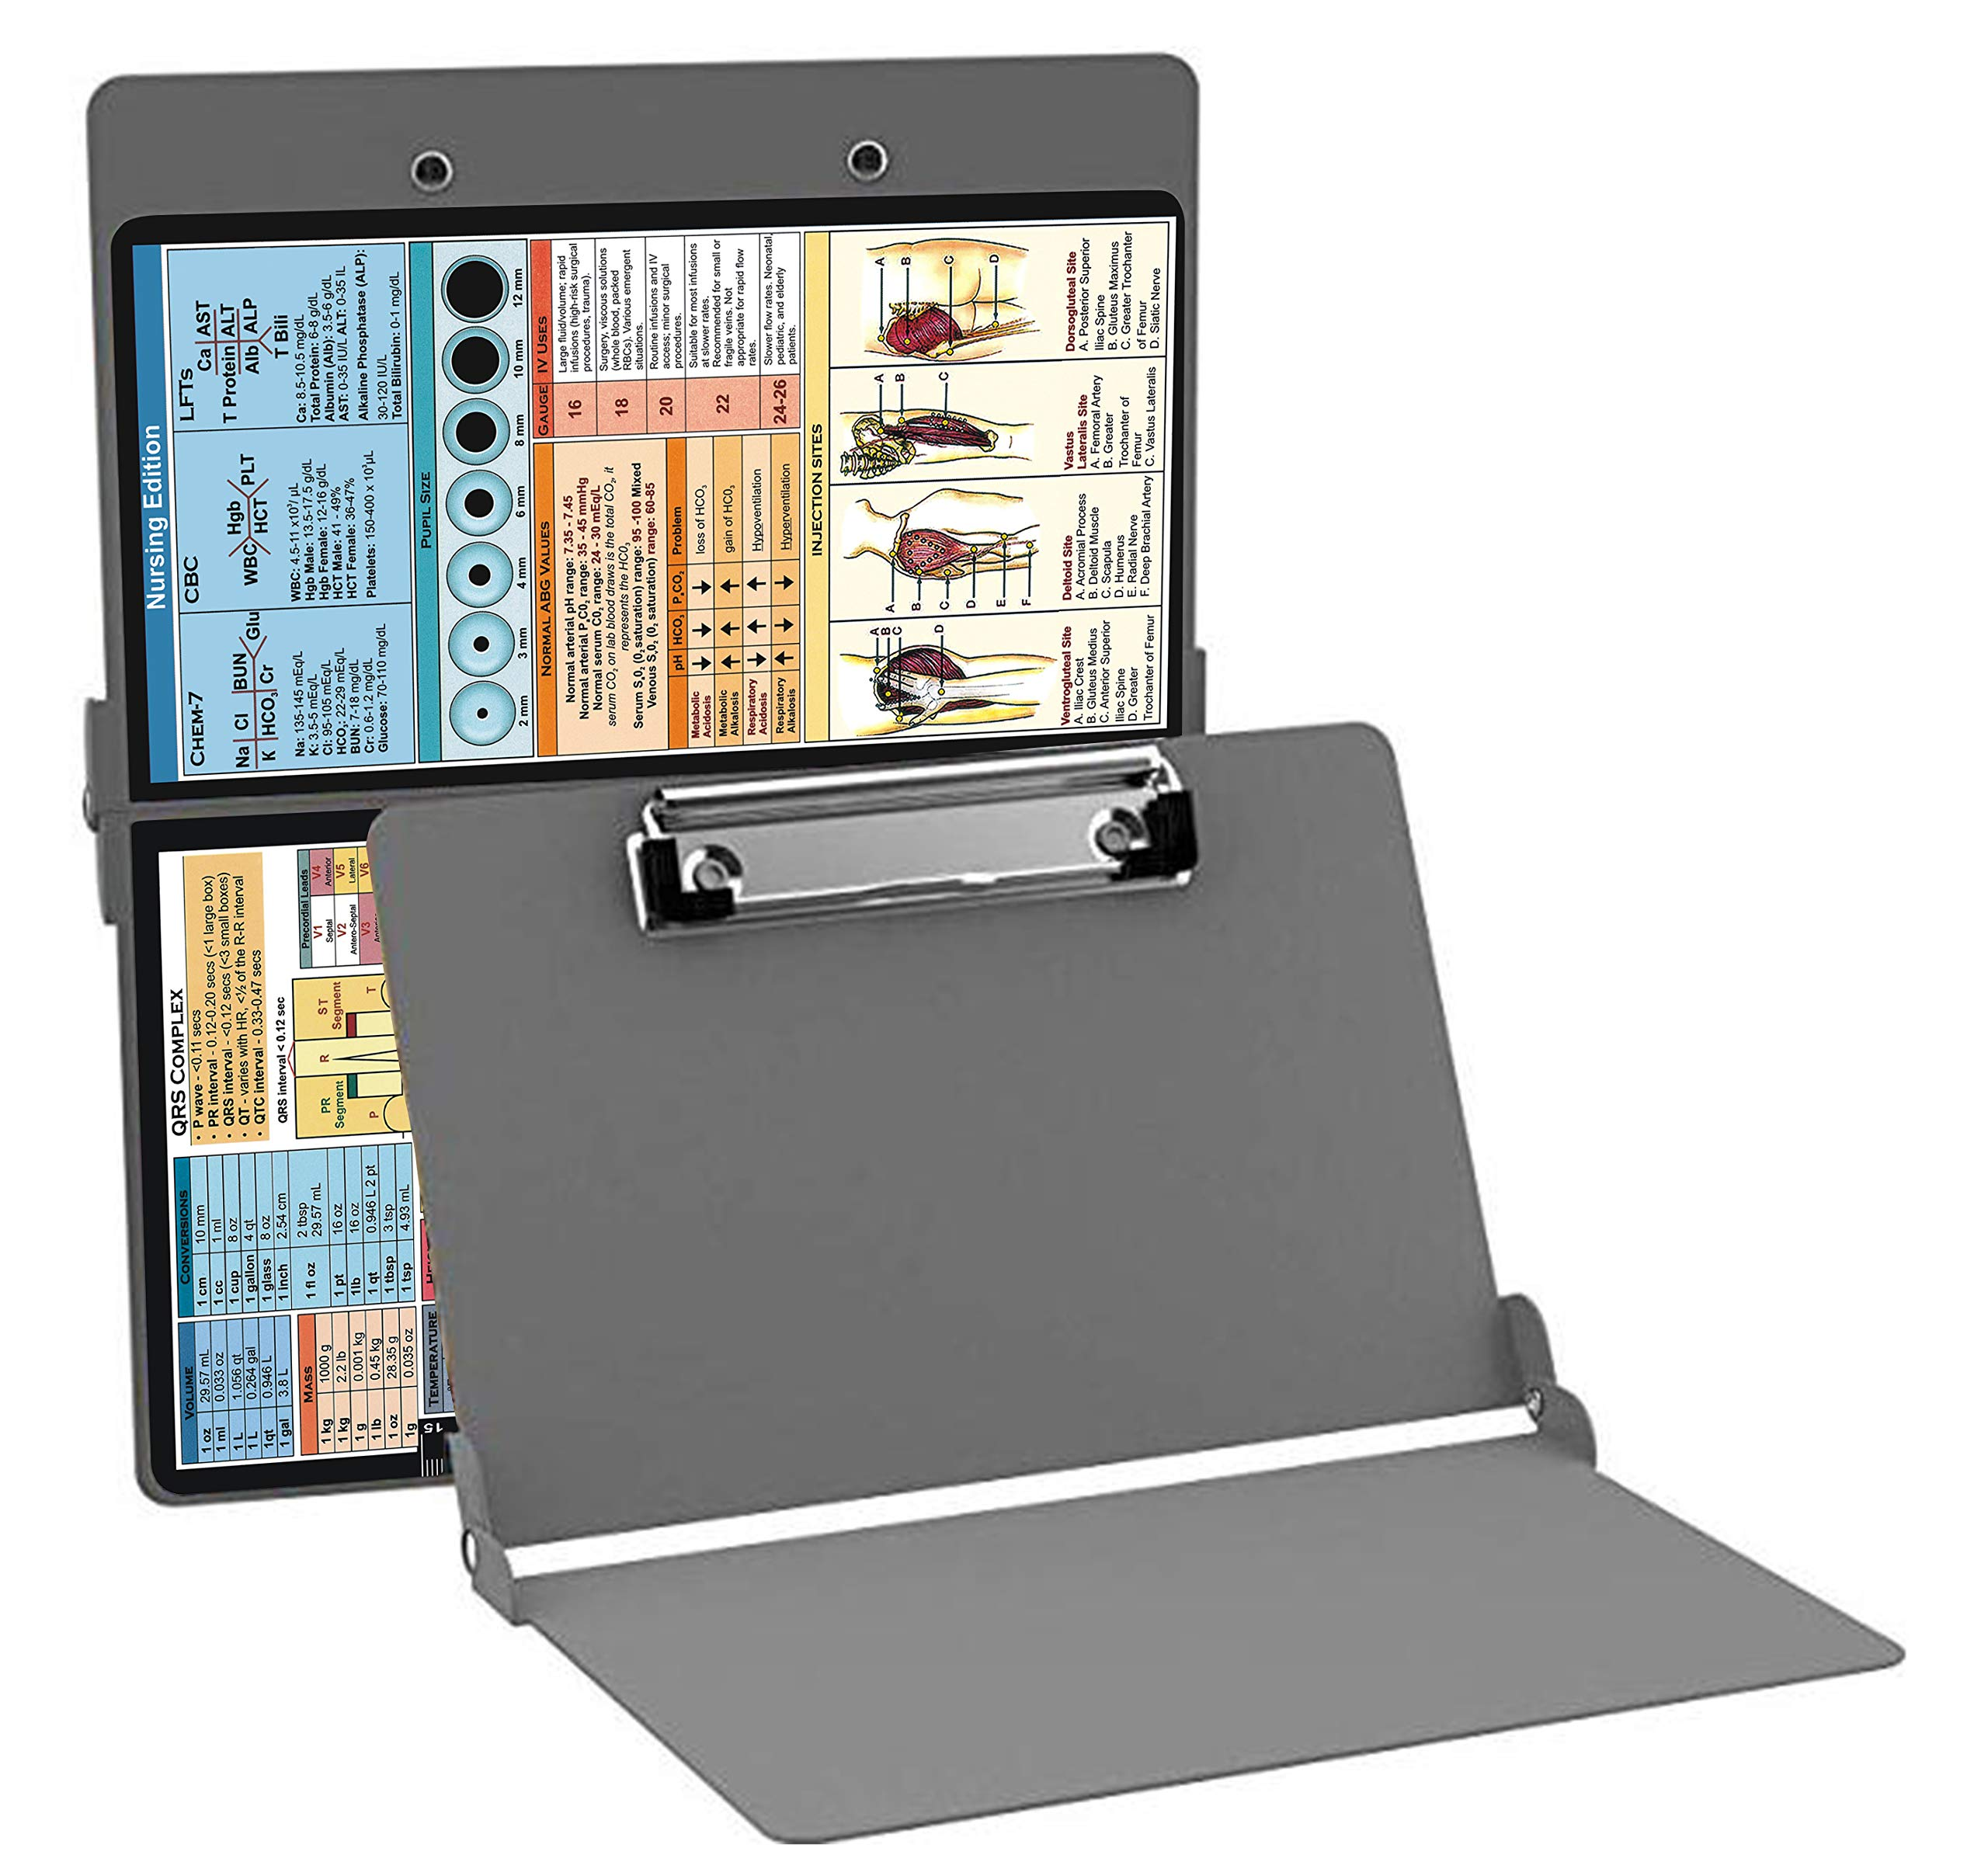 Nursing Clipboard Silver(Aluminum Clipboard Nursing Edition Silver) Foldable Clipboard Letter Size by PoneyChoice